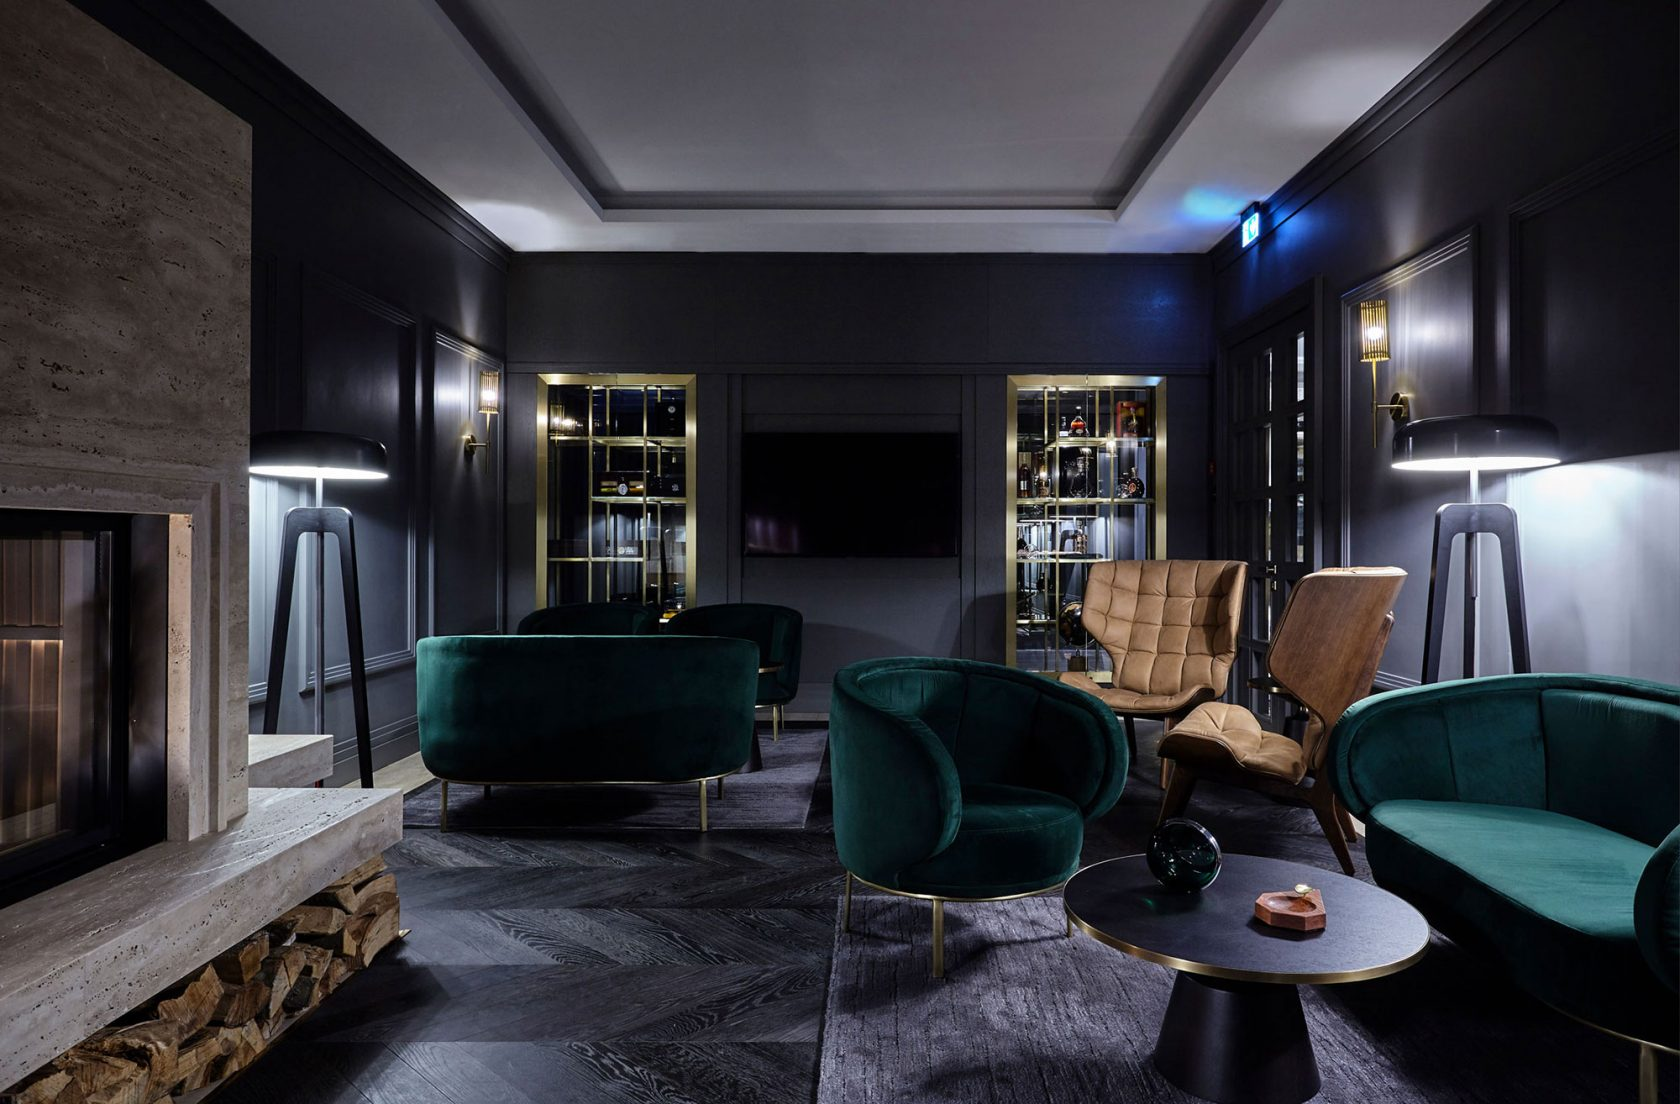 Ikador Luxury Boutique Hotel & Spa Edgar Cigar Bar